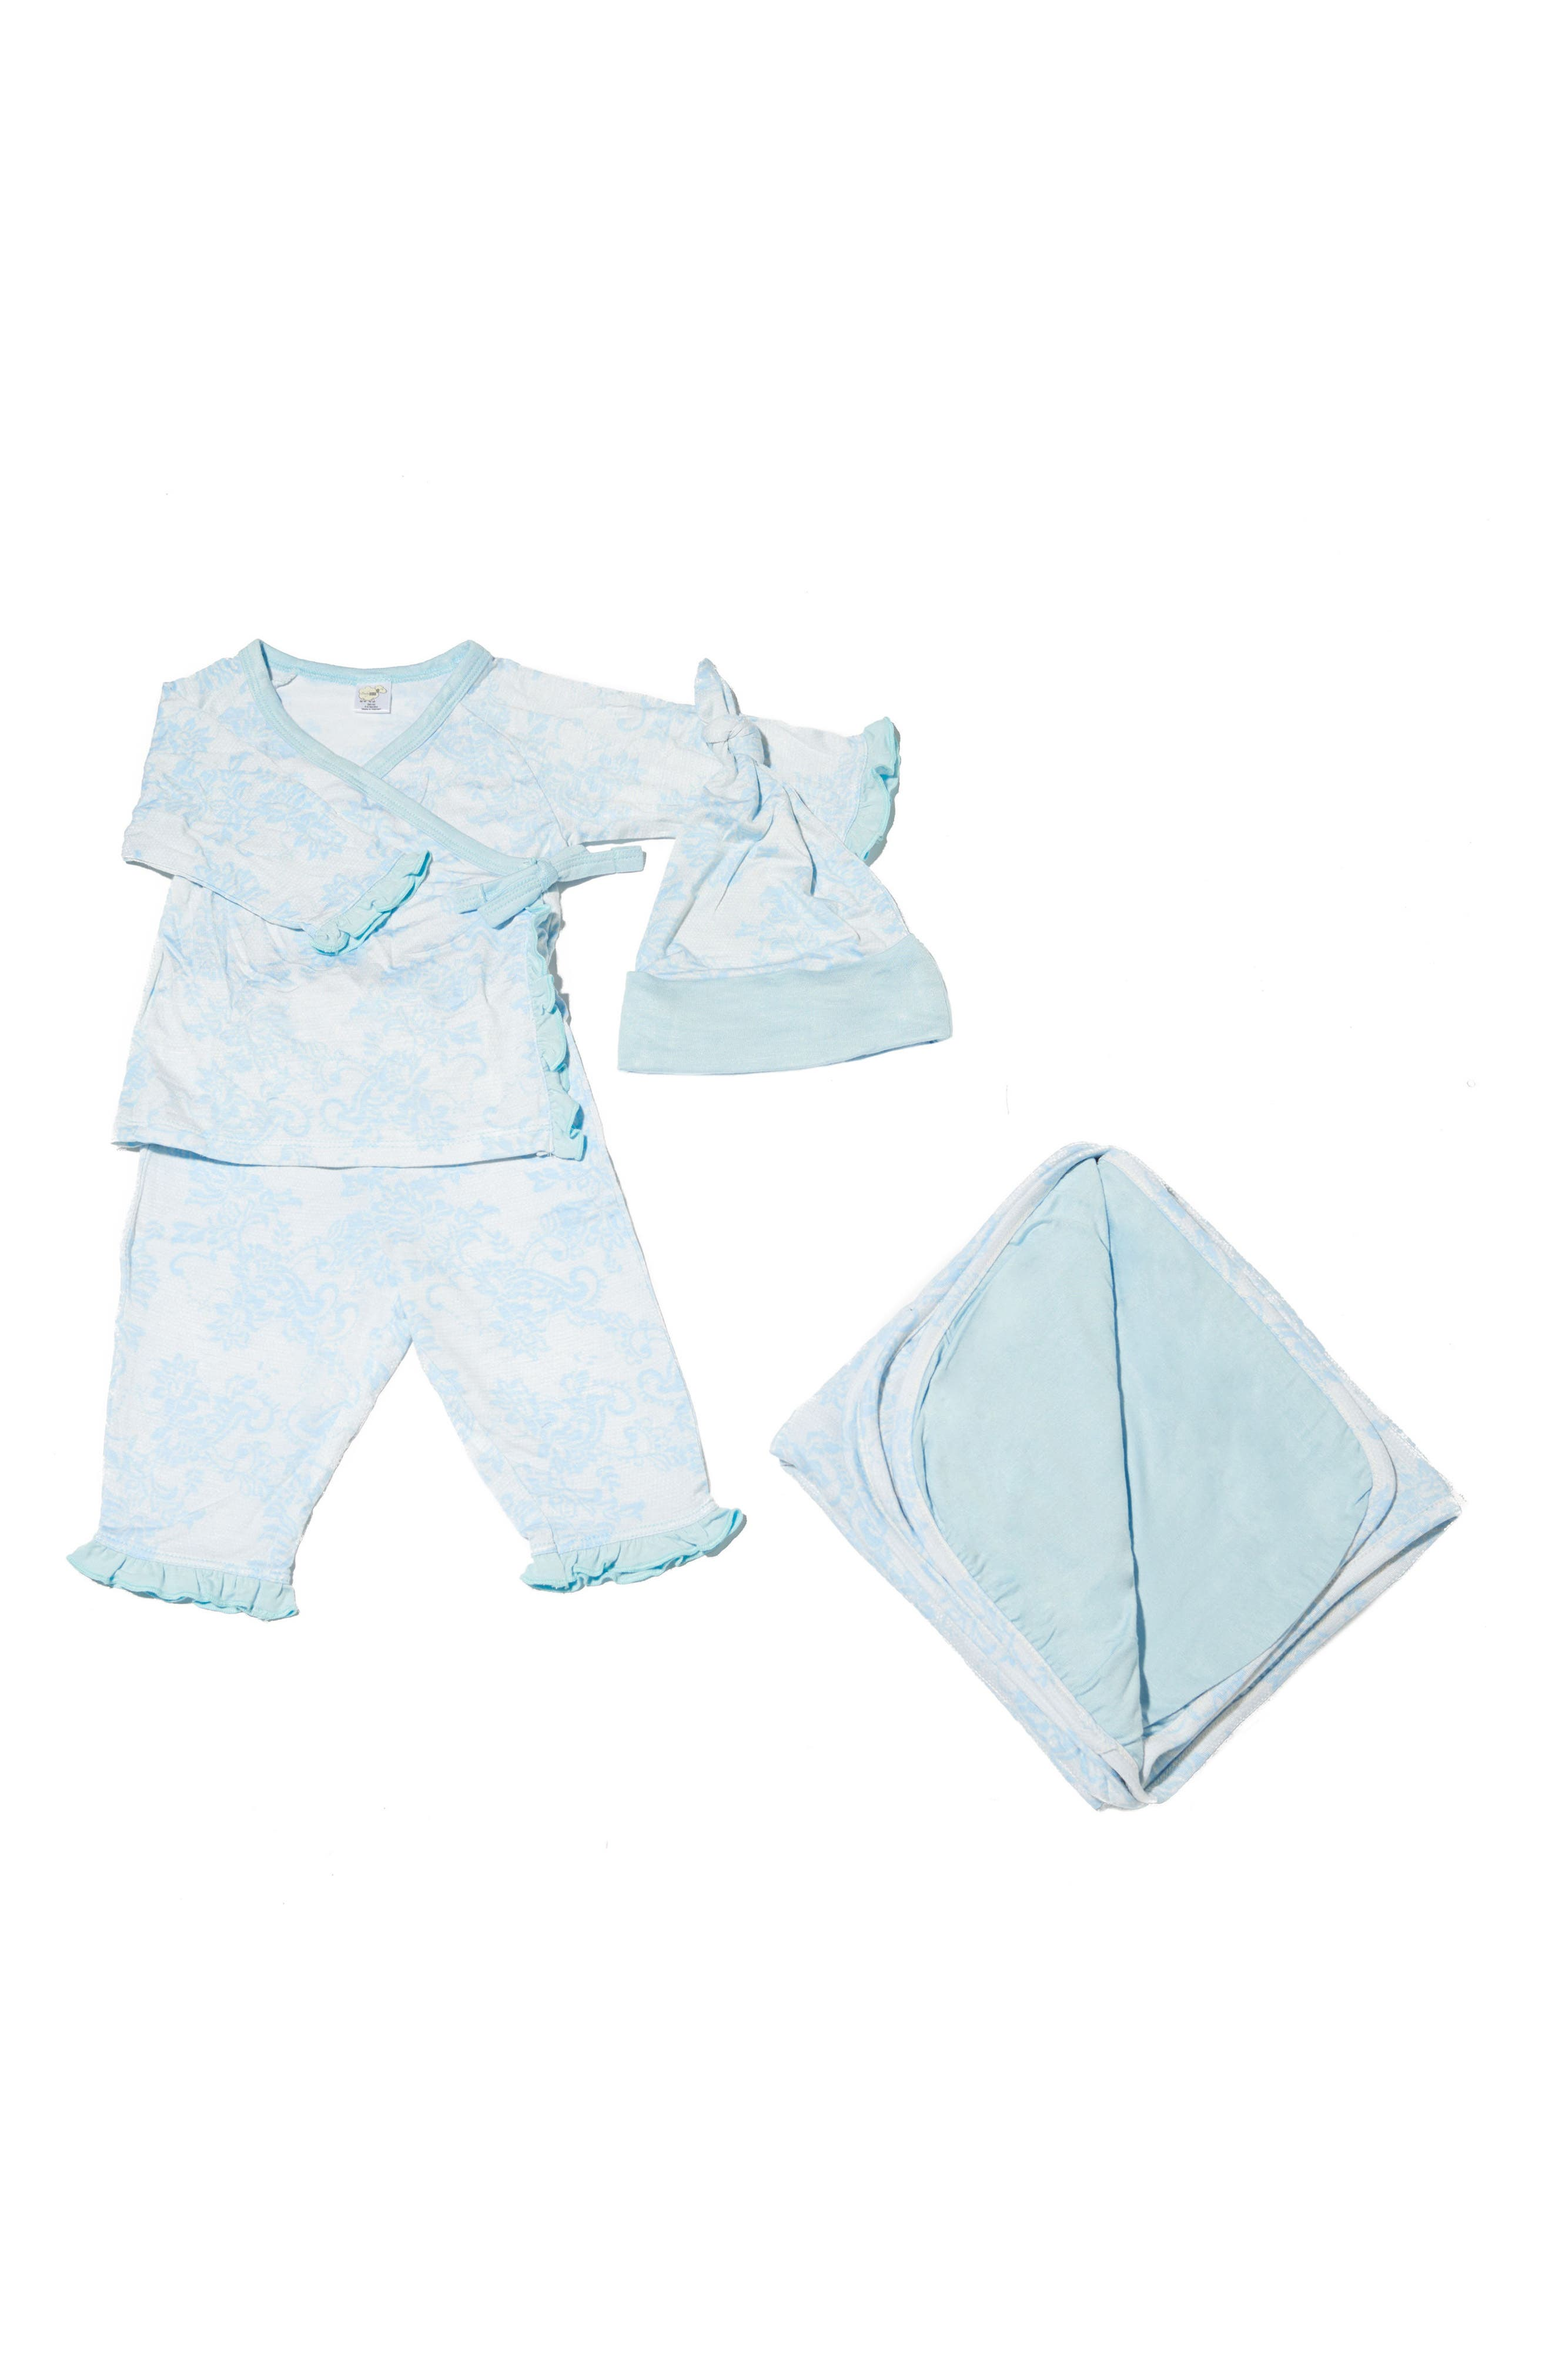 Ruffle Kimono Top, Pants, Hat & Blanket Set,                             Main thumbnail 1, color,                             Chantilly